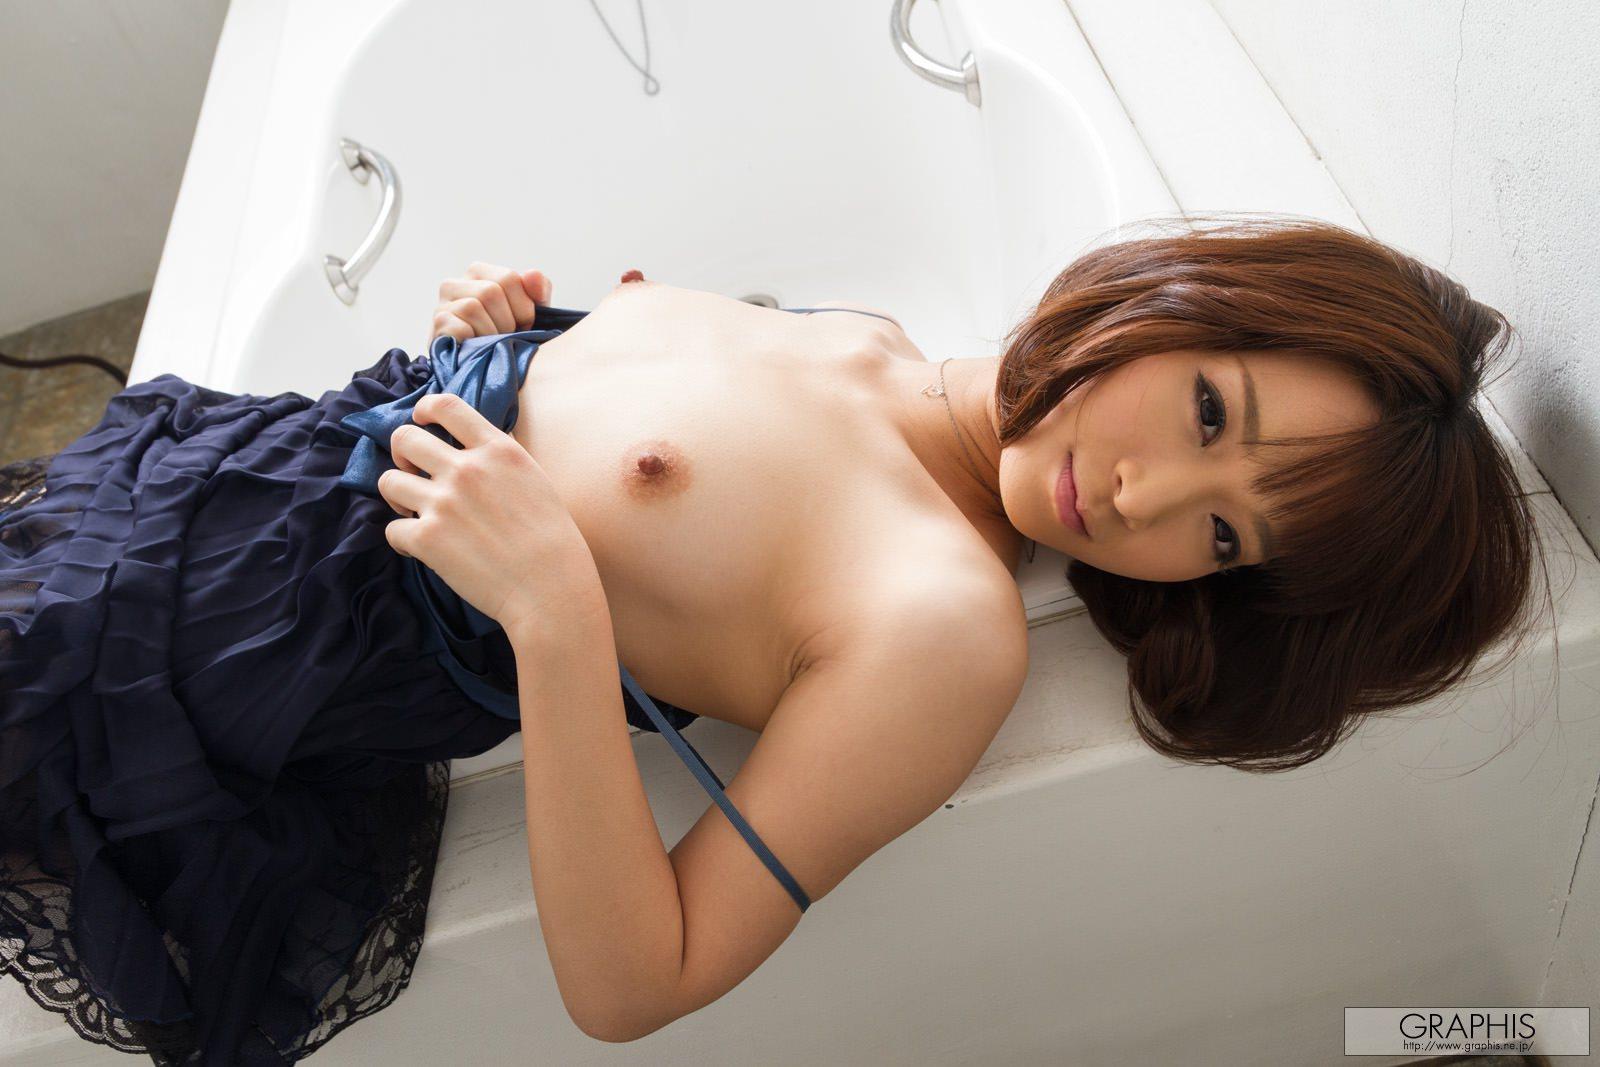 mayu-kamiya-bathroom-black-stockings-asian-naked-graphis-11